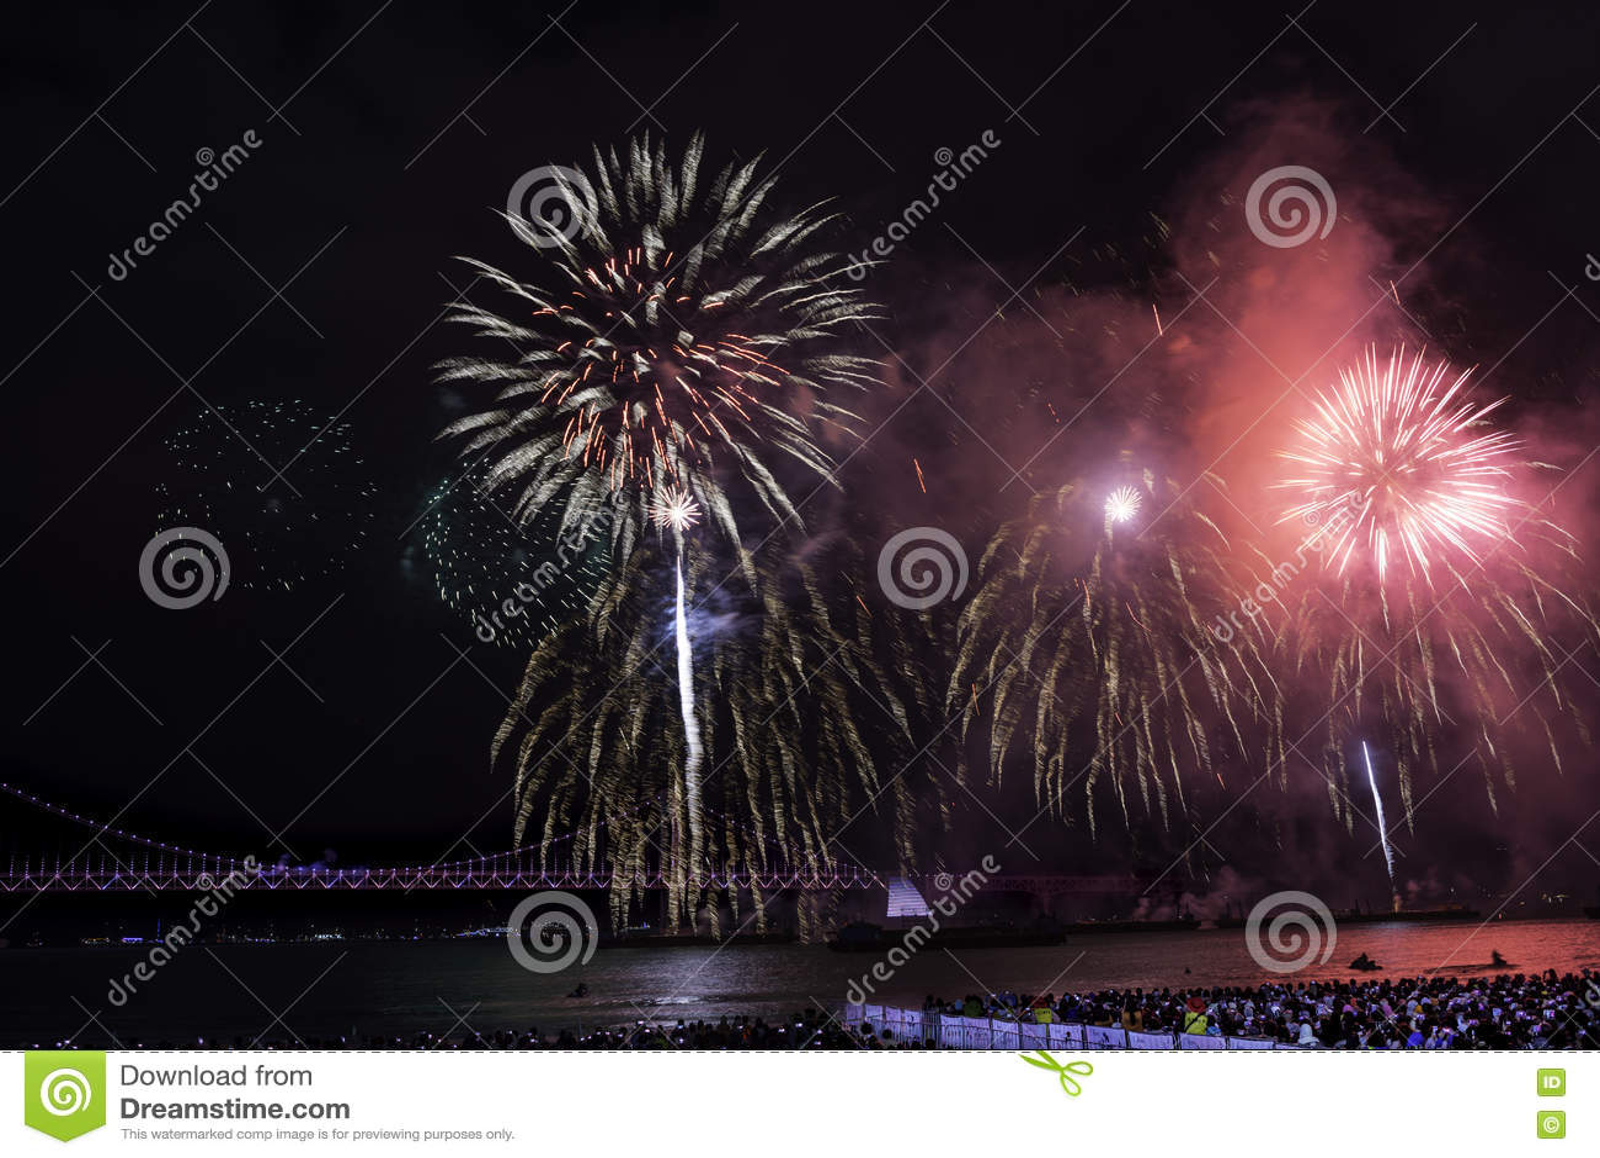 Busan fajerwerków festiwal 2016 - nocy pirotechnika